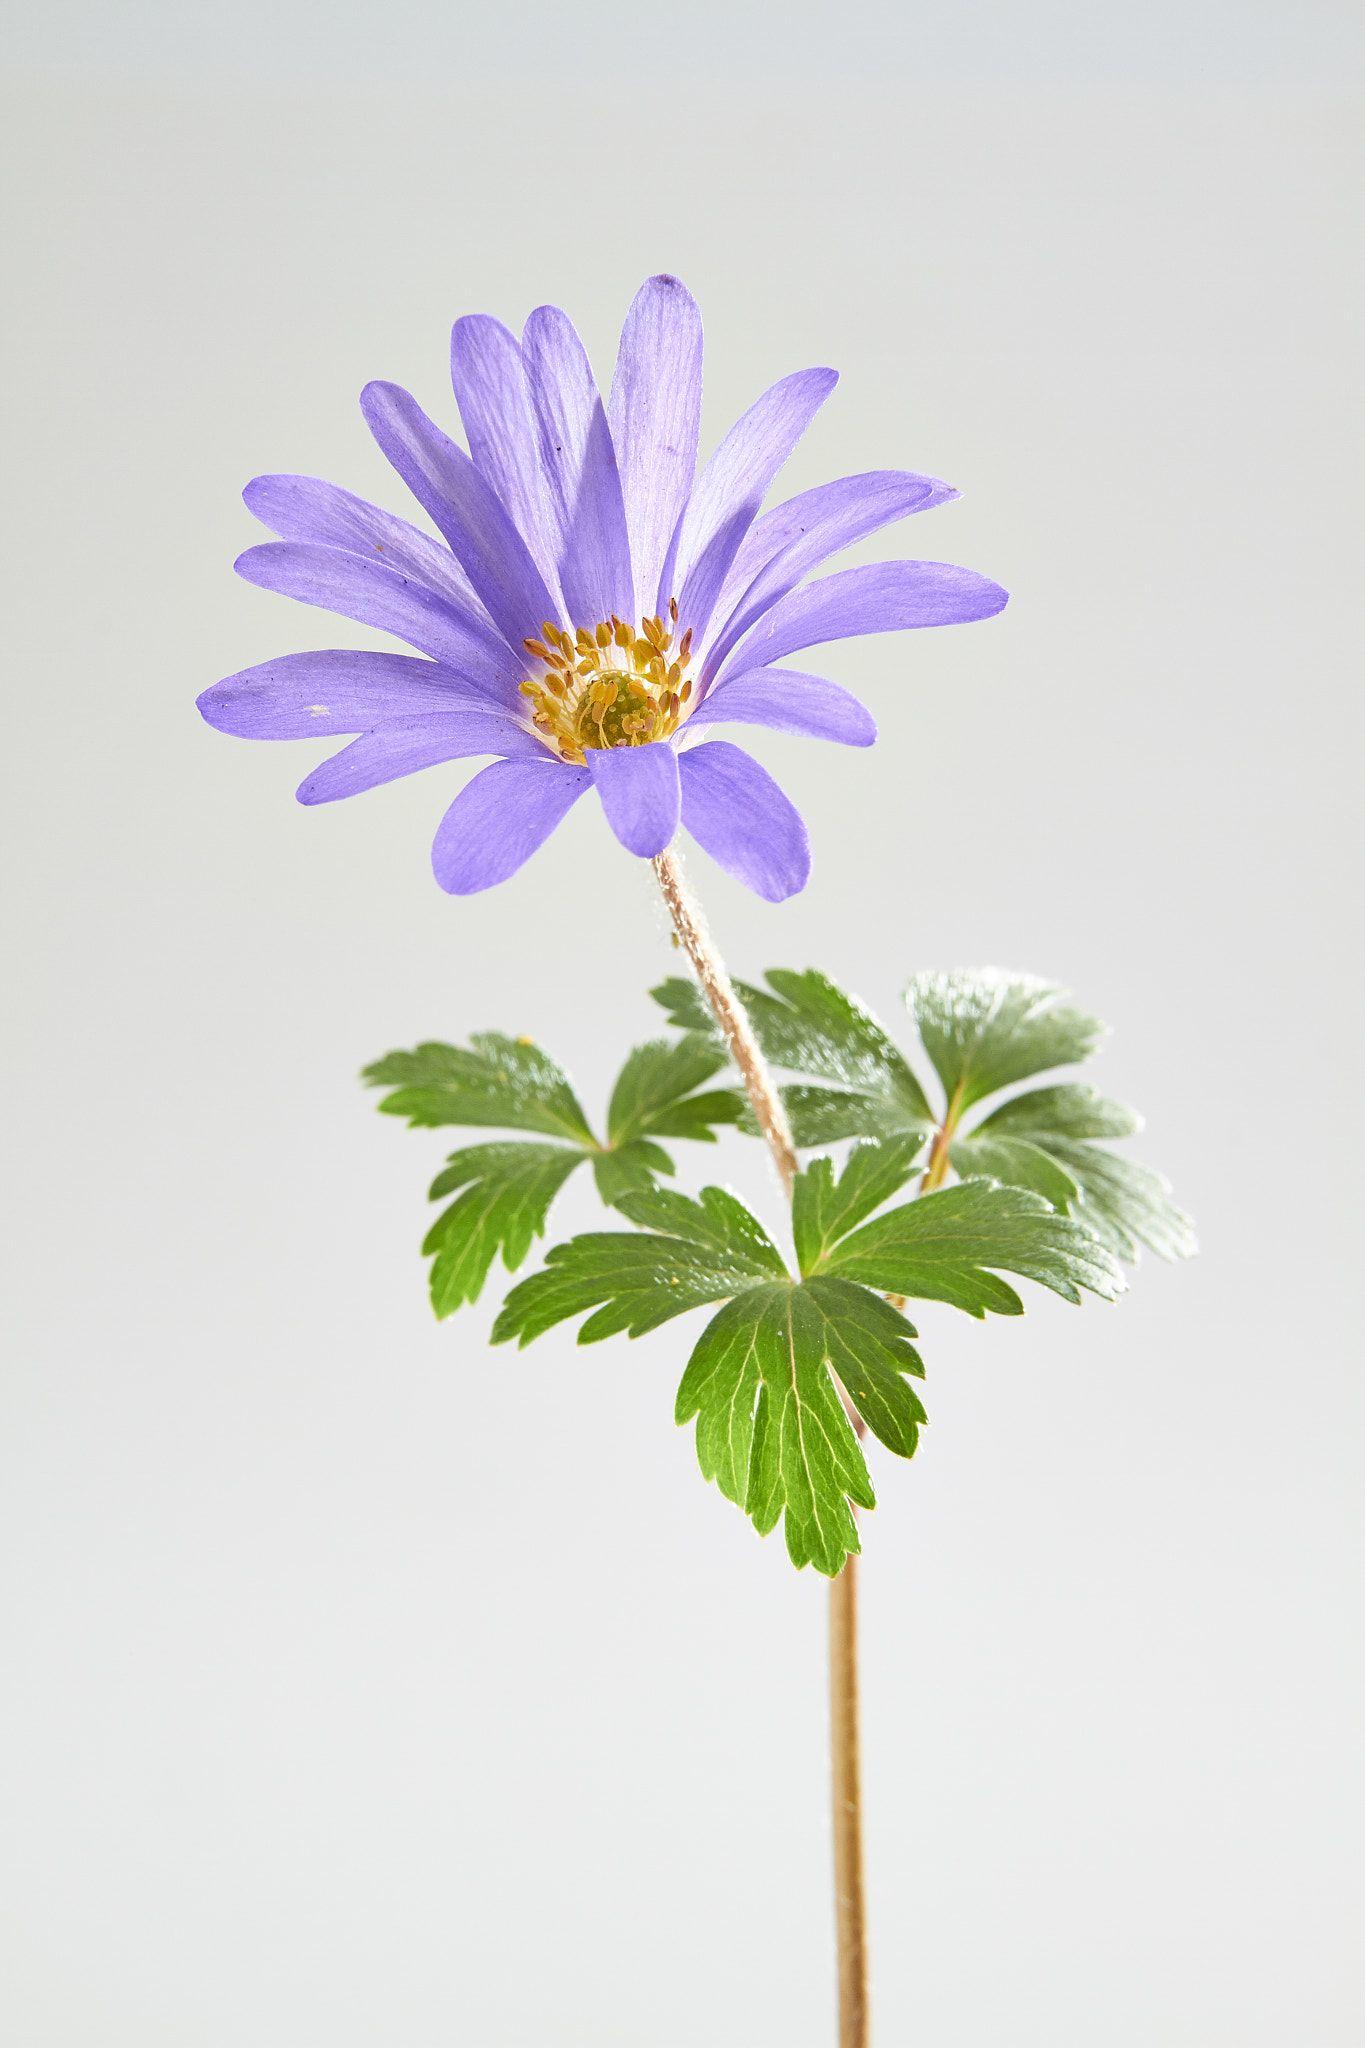 Anemone Blanda Springtime Flowers En 2020 Fundas